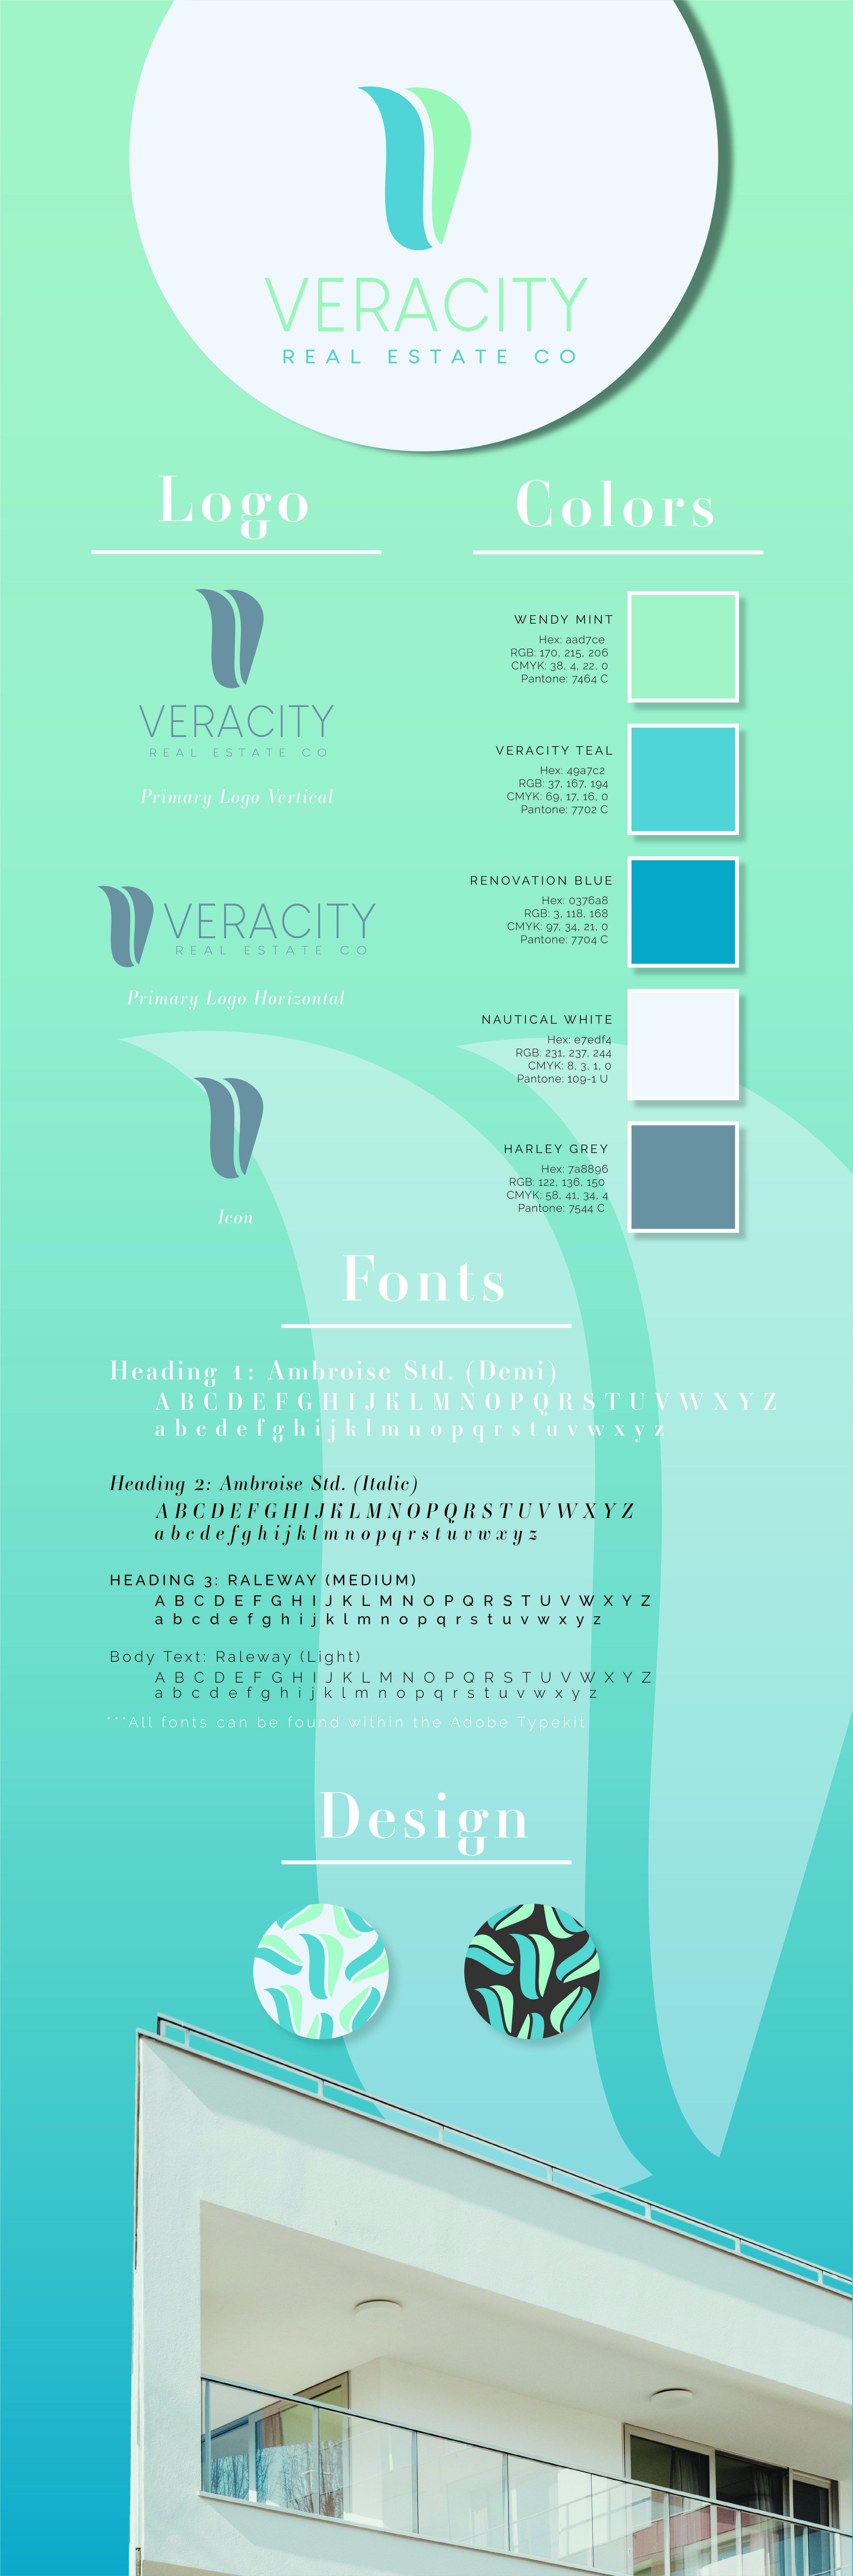 Veracity Branding Guidelines-01.jpg